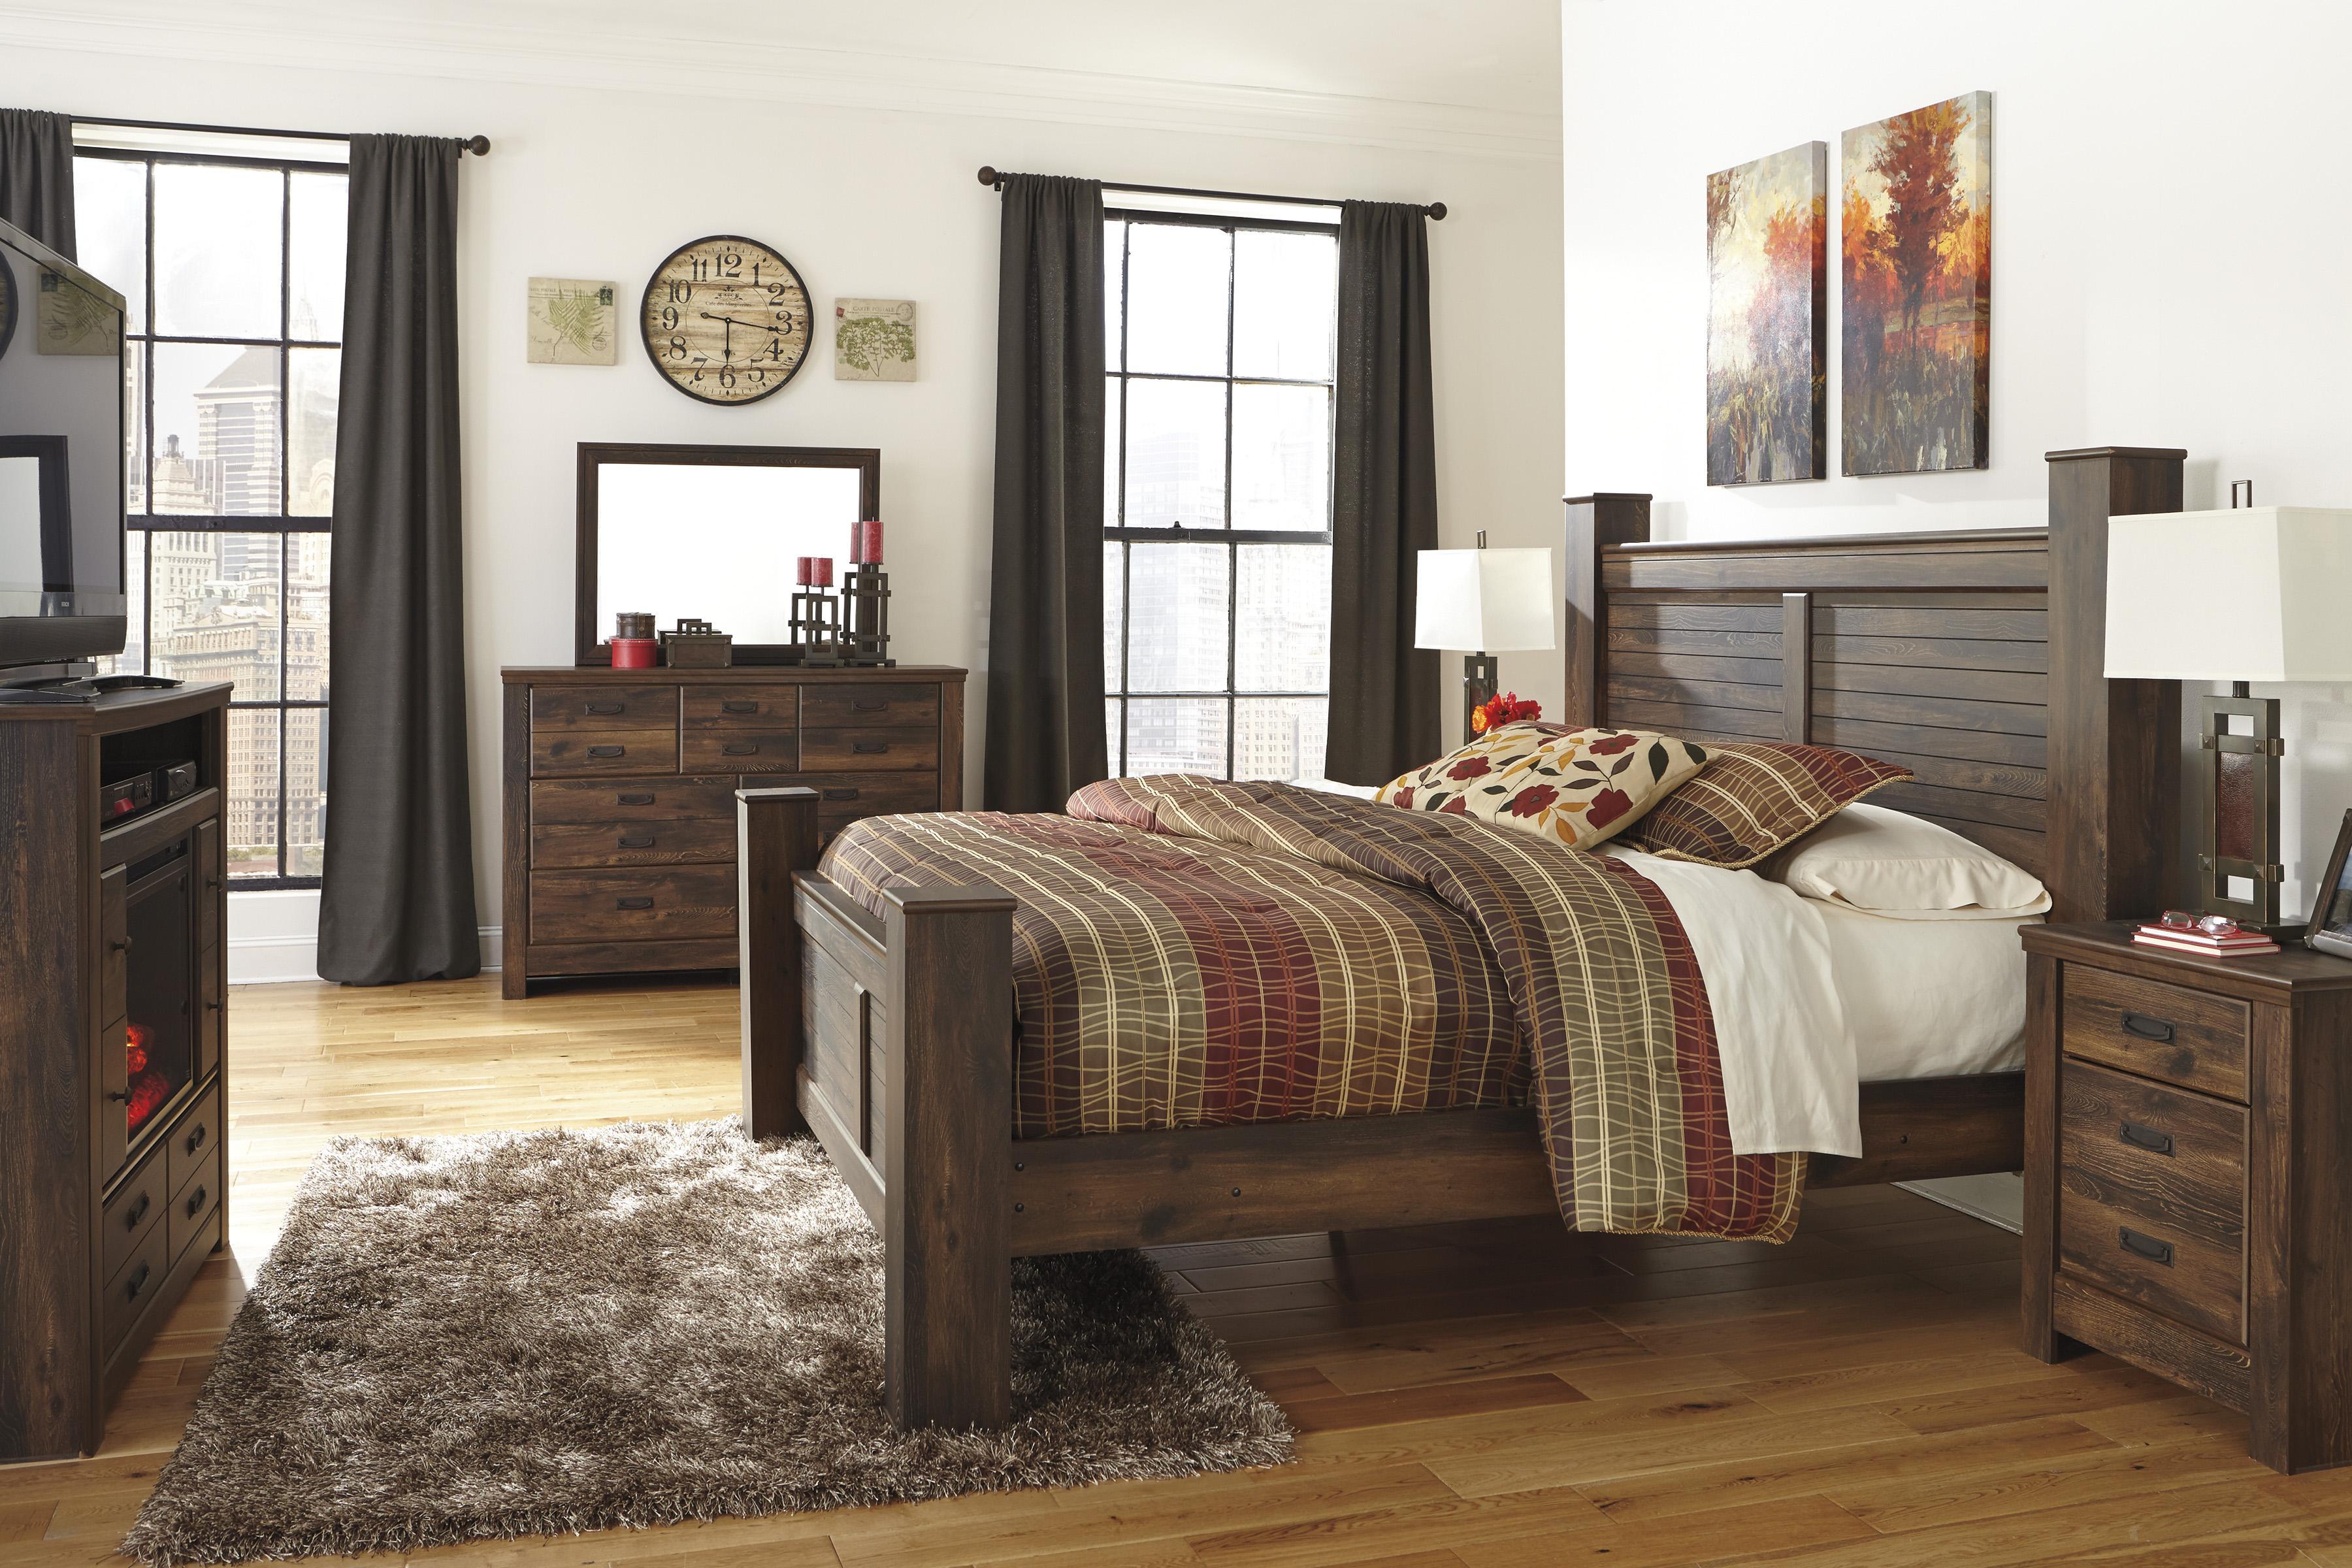 Signature Design by Ashley Quinden King Bedroom Group - Item Number: B246 K Bedroom Group 6